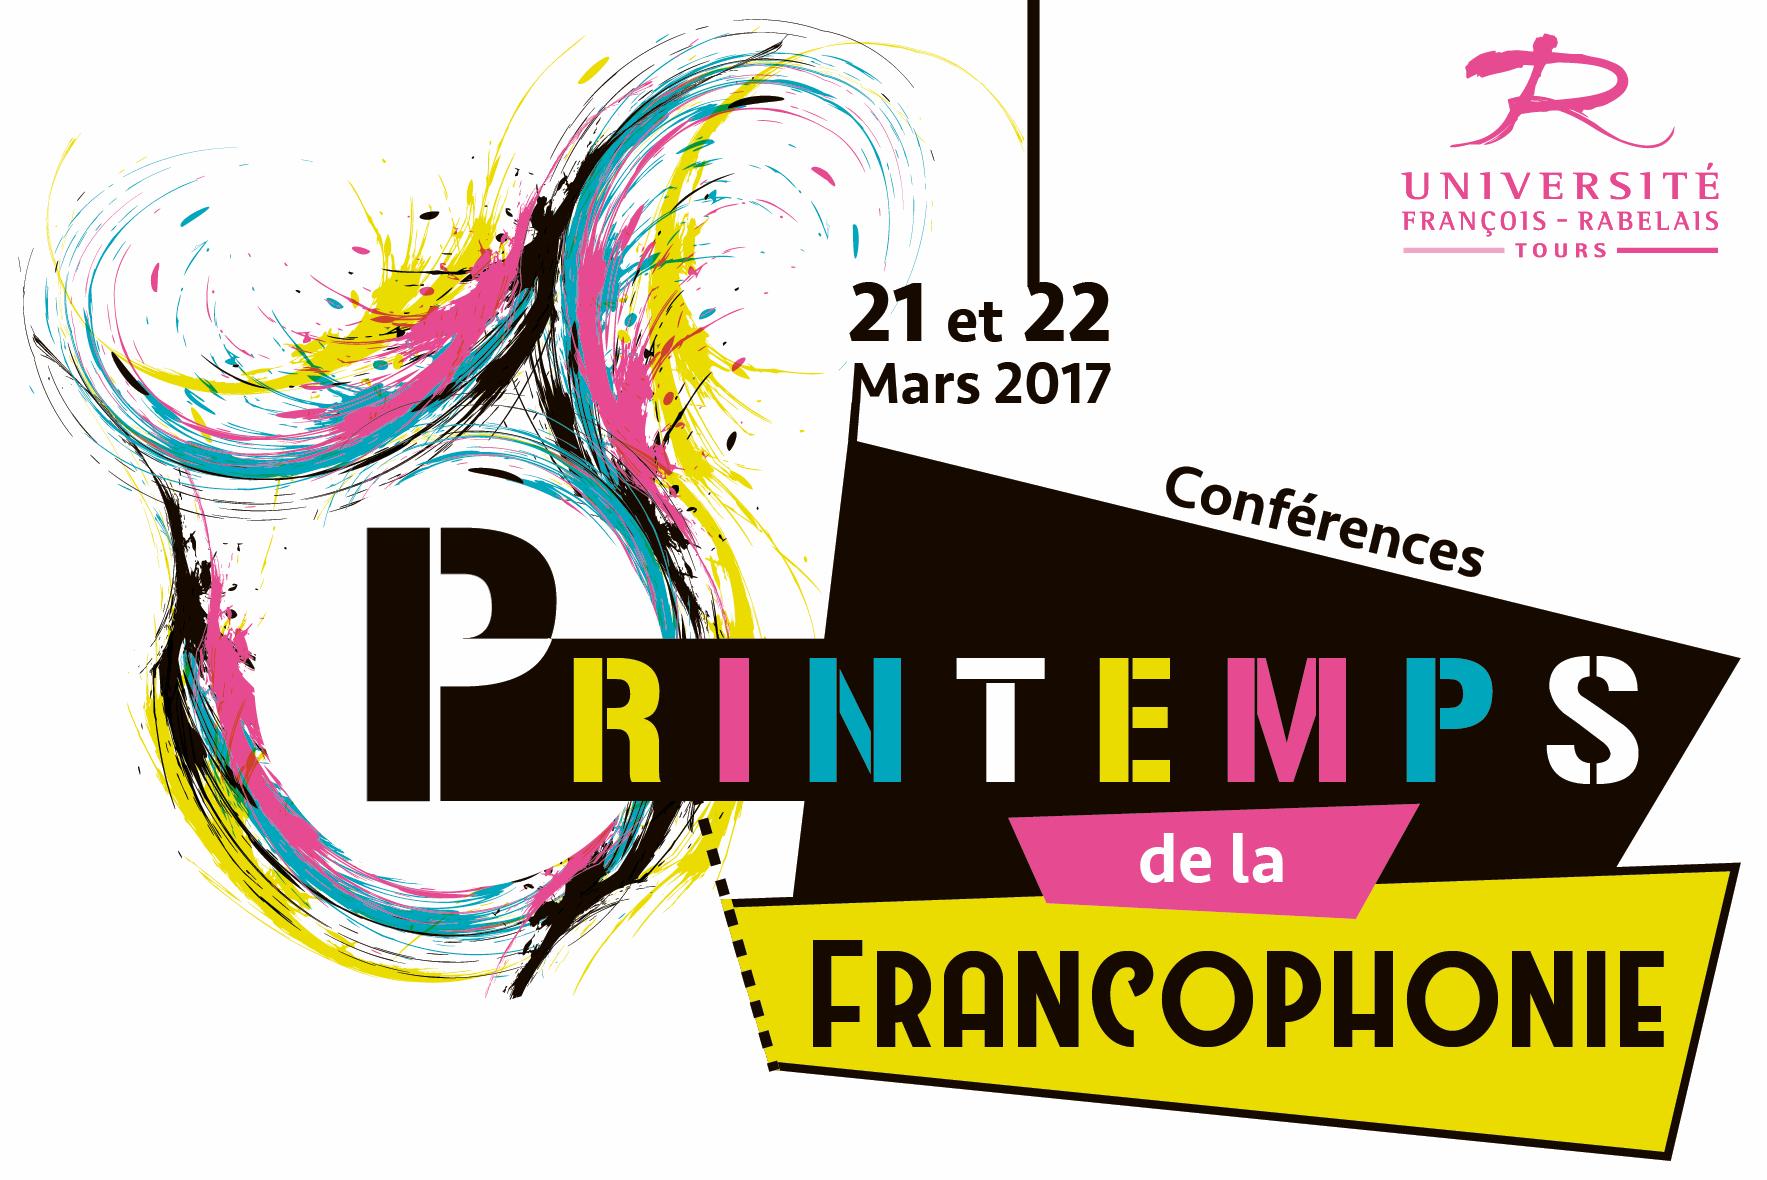 150x100_Printemps francophonie.jpg